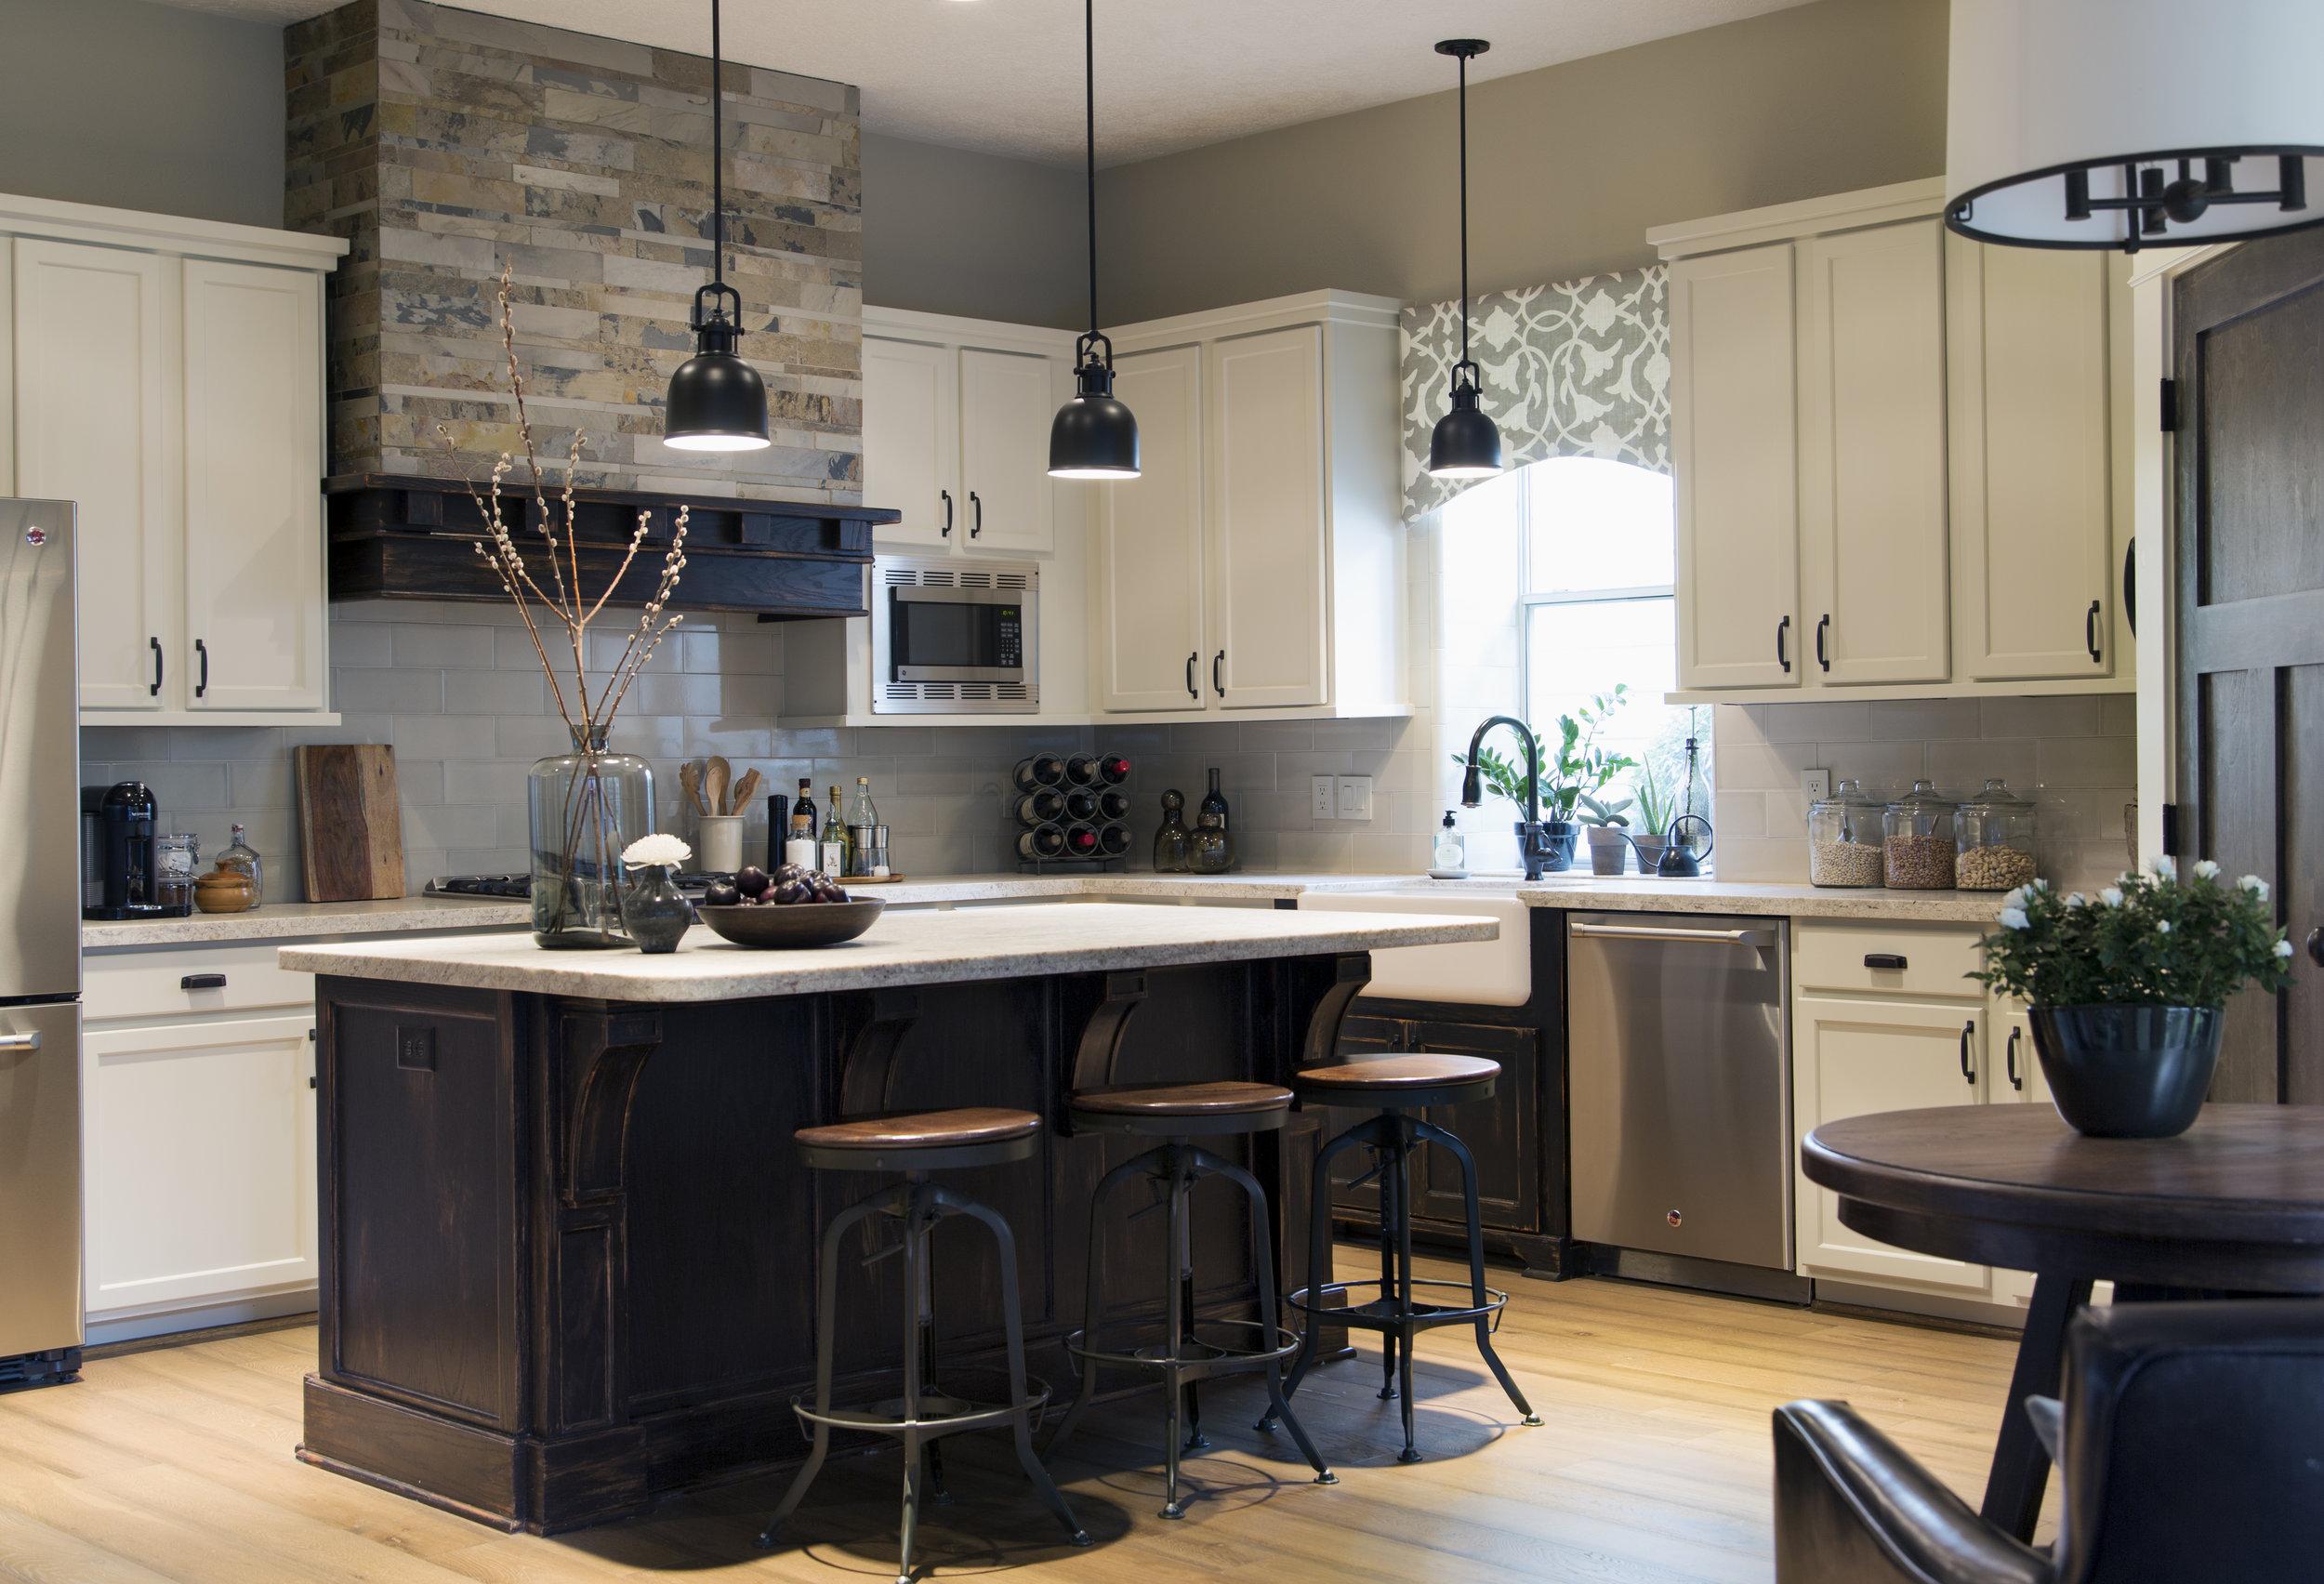 Kitchen remodel - Carla Aston Designer